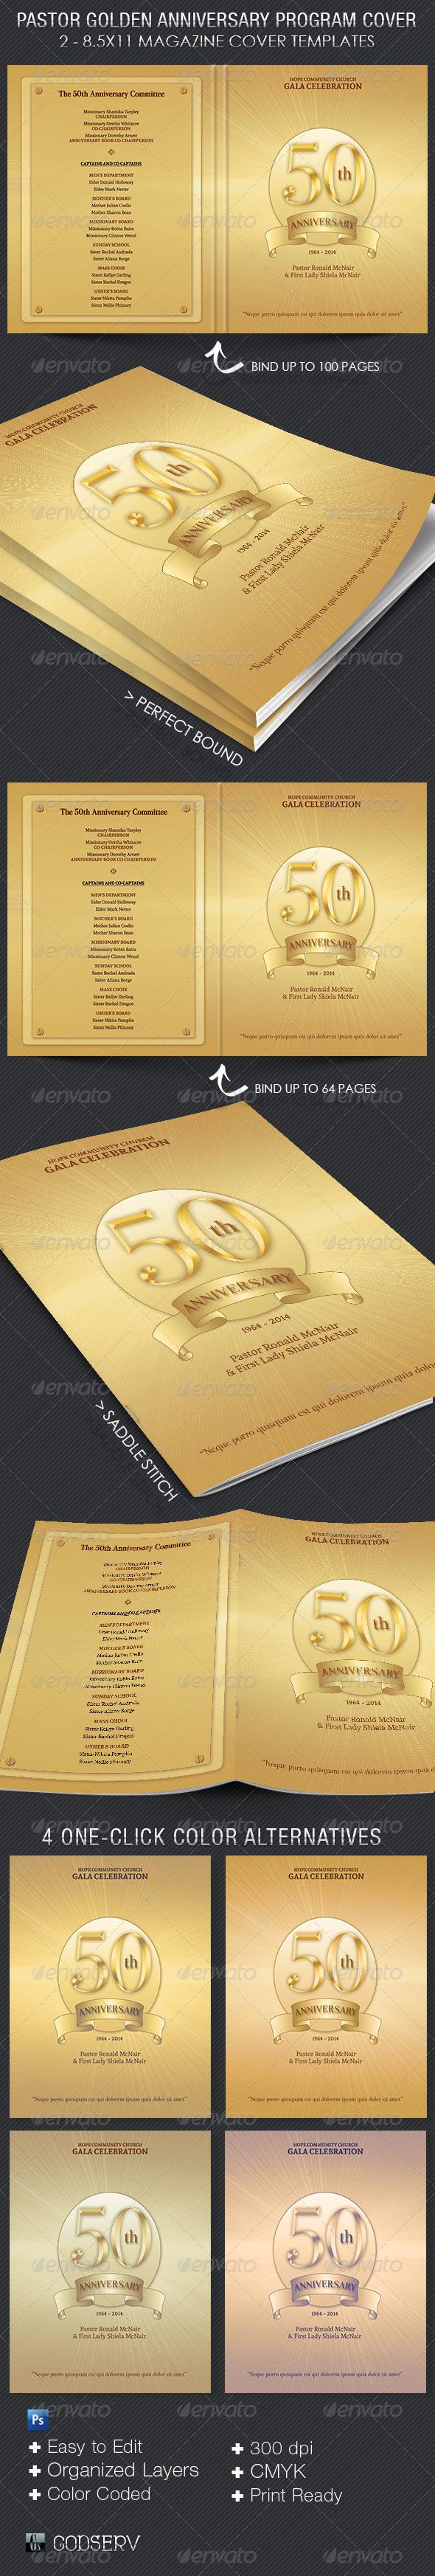 GraphicRiver Pastor Golden Anniversary Program Cover Template 7751974